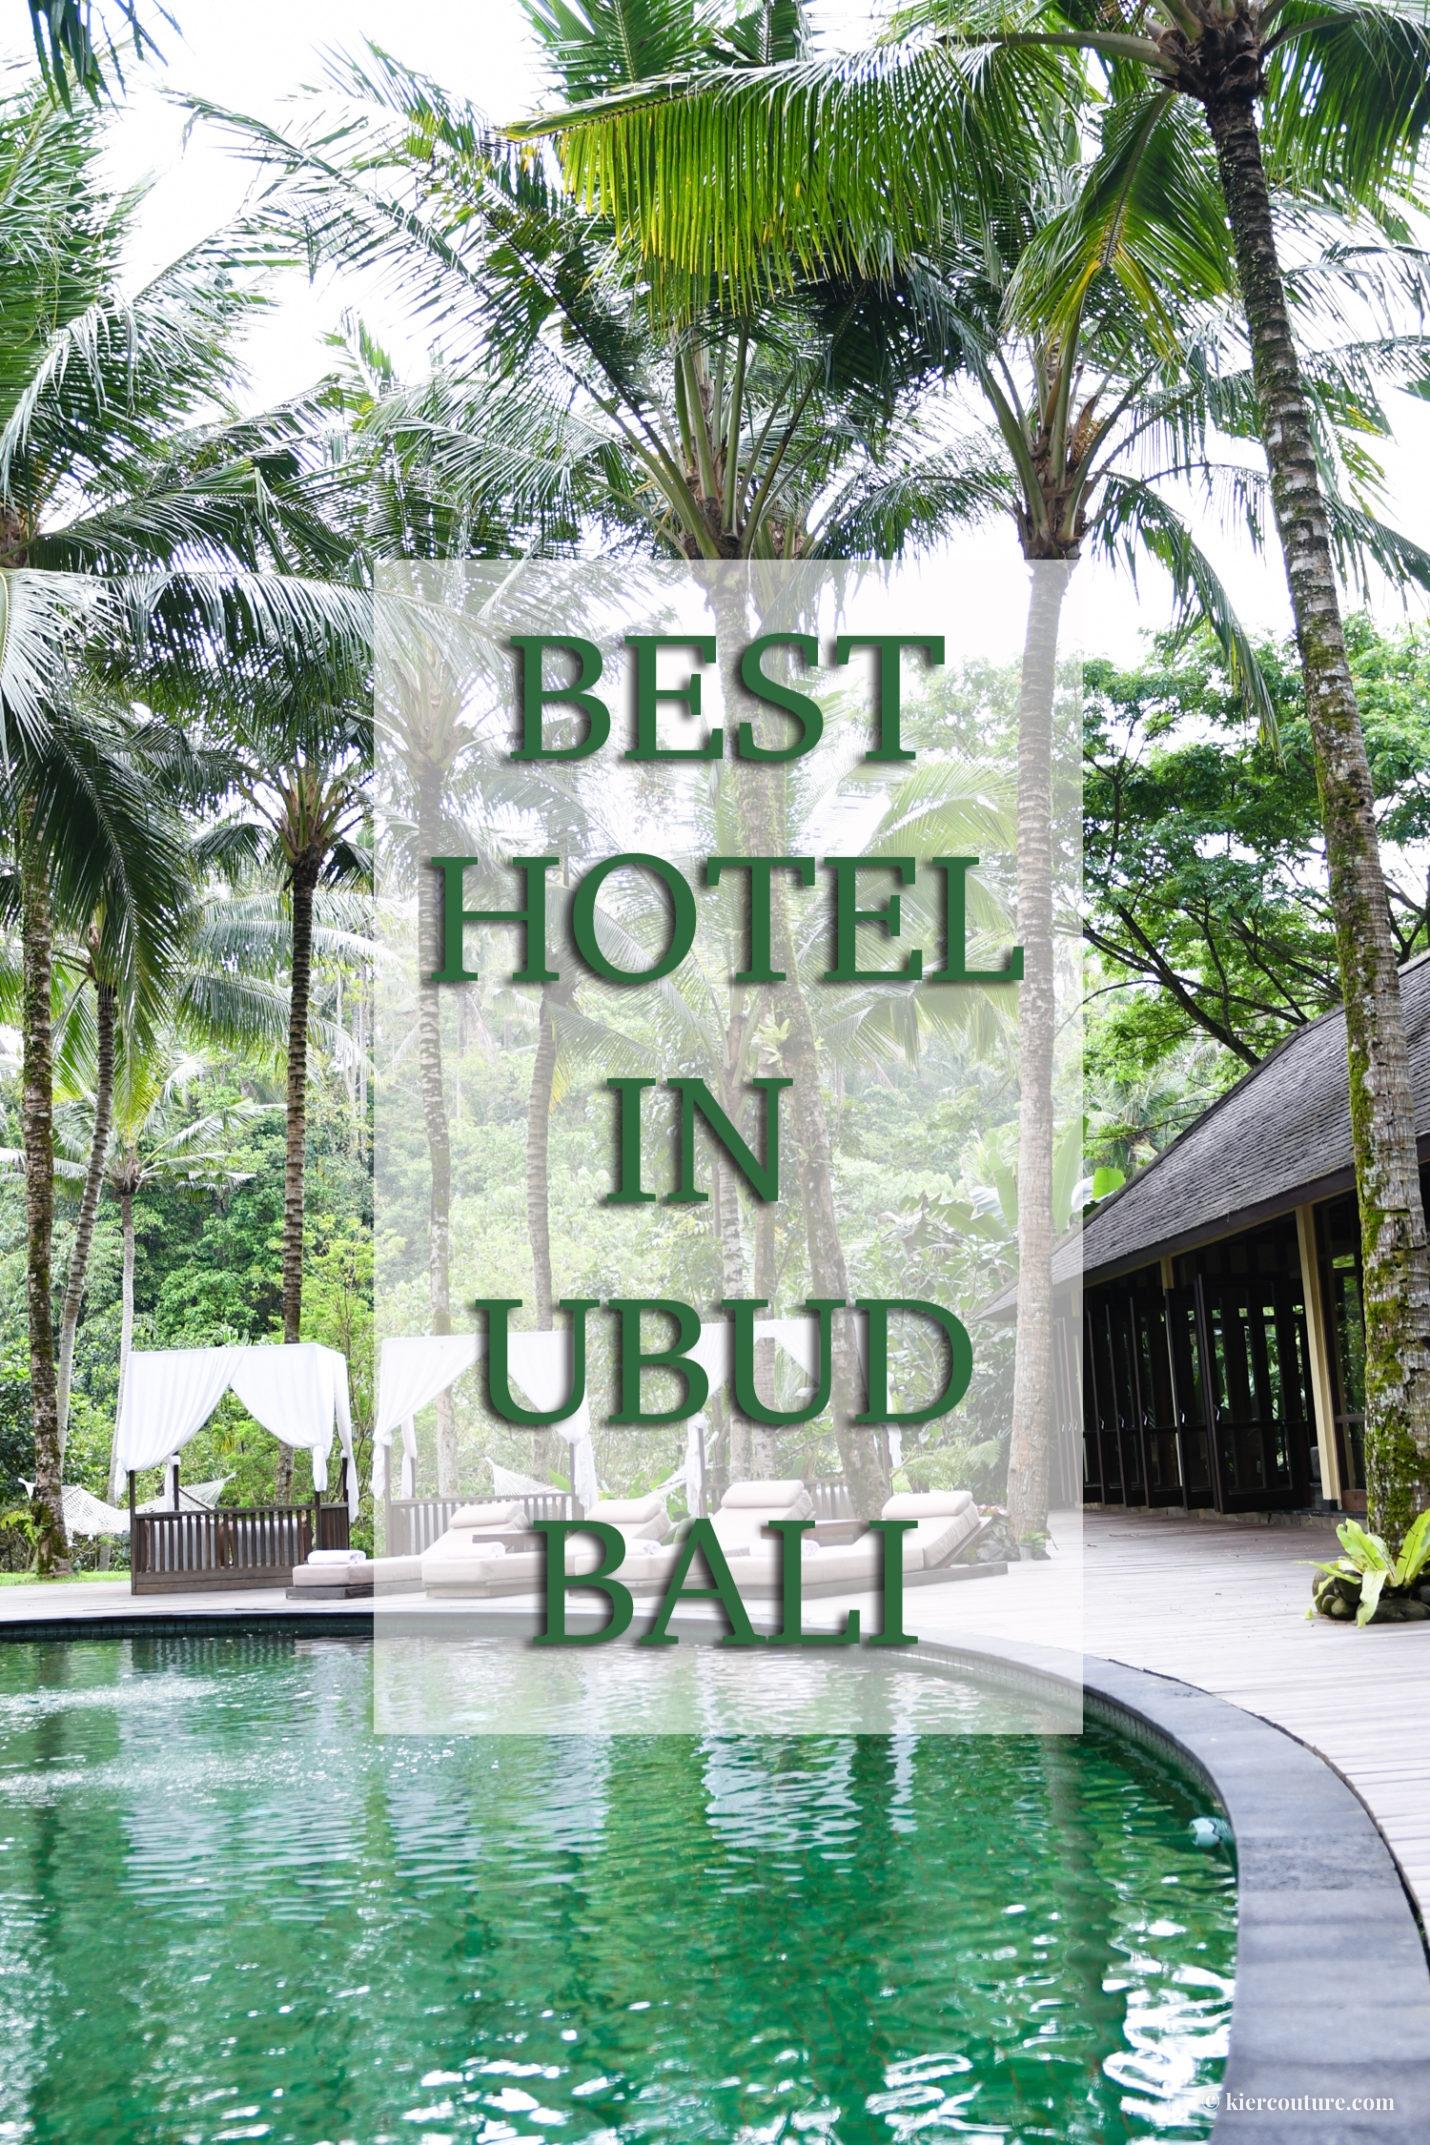 BEST HOTEL IN UBUD BALI